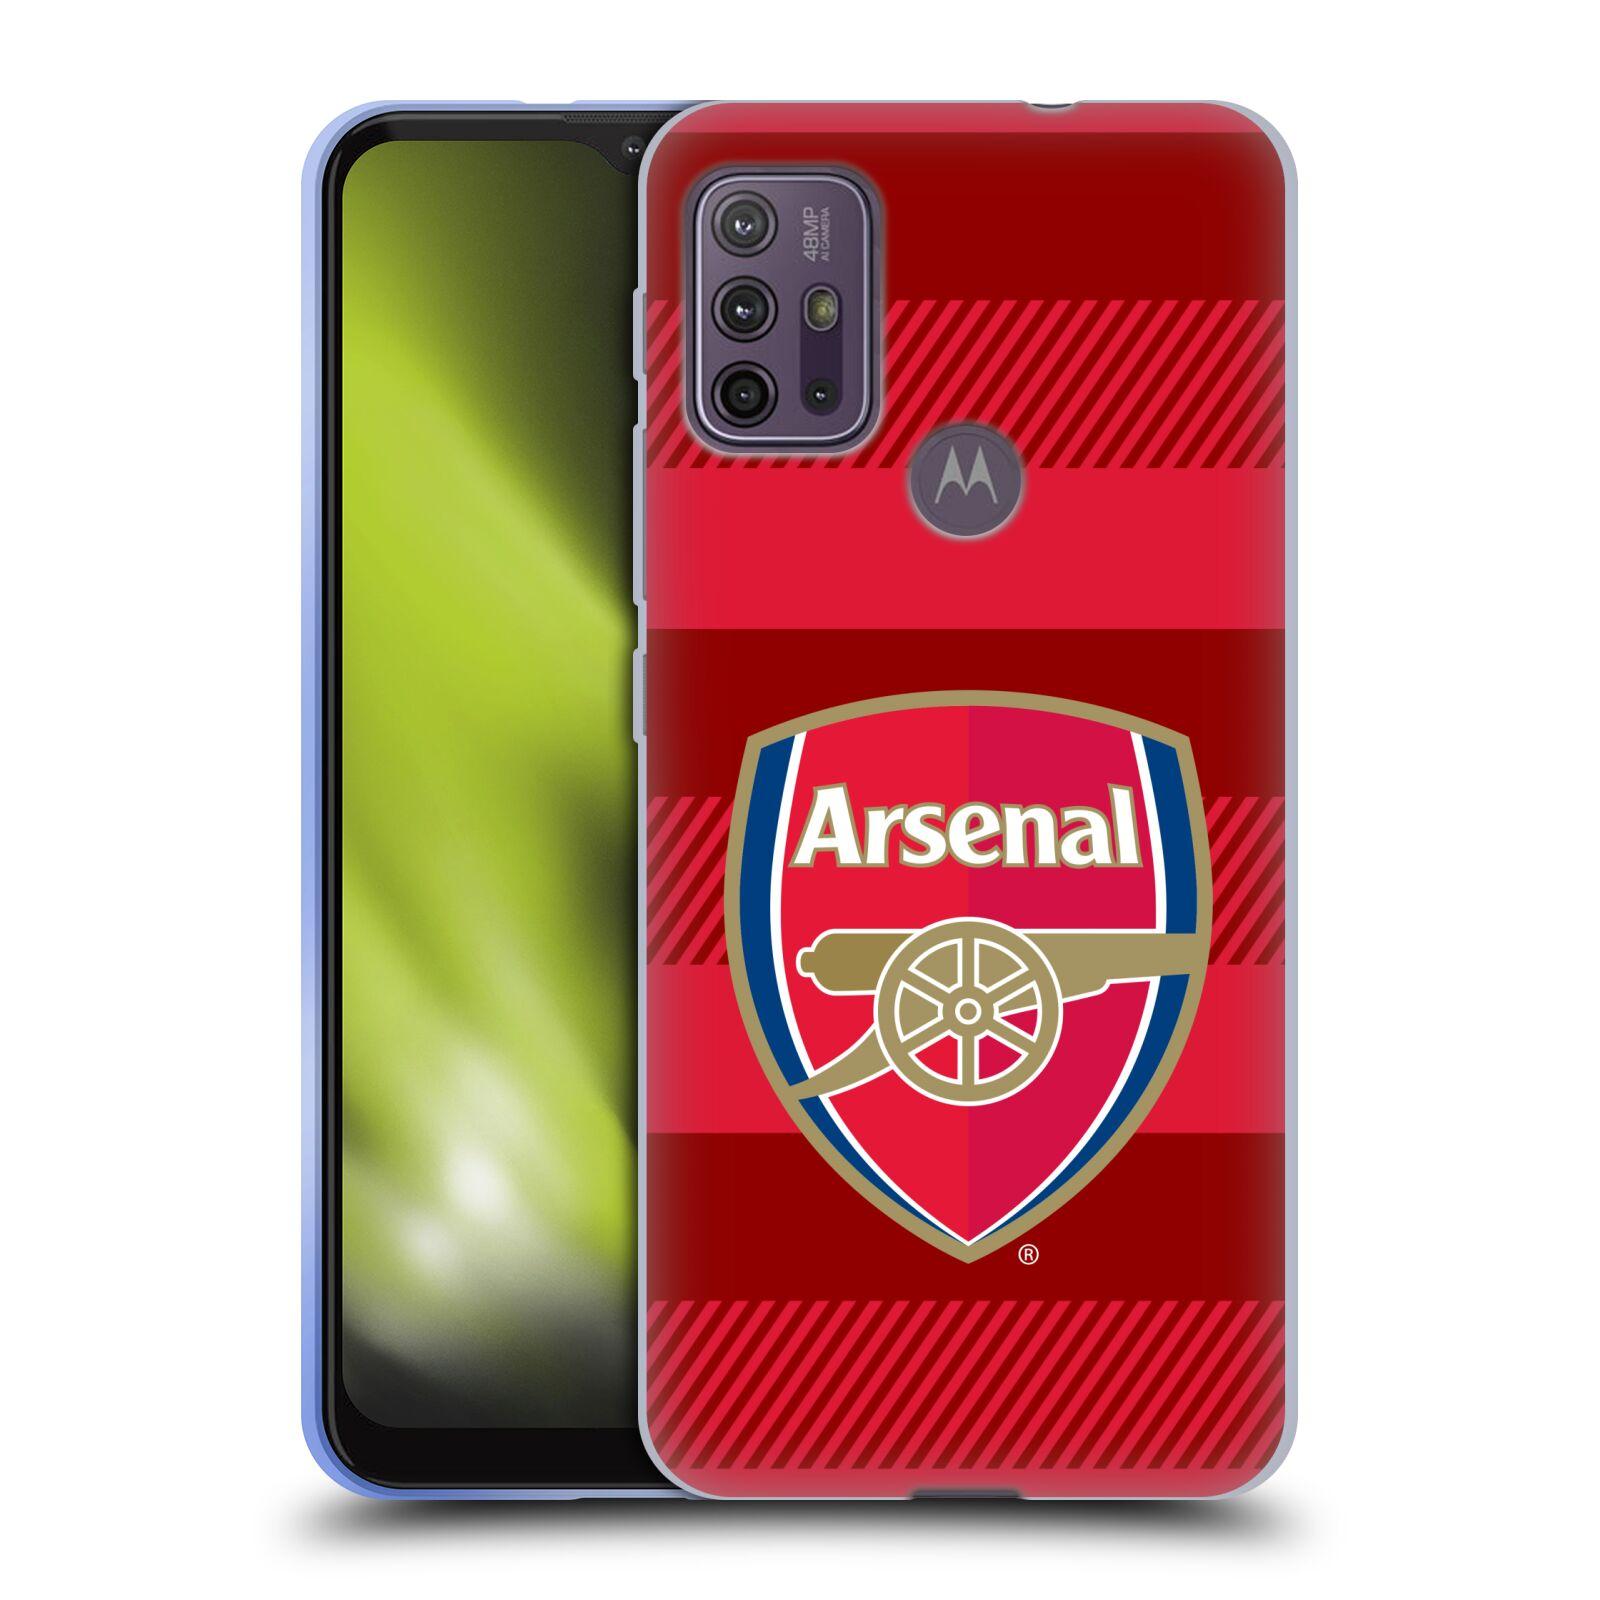 Silikonové pouzdro na mobil Motorola Moto G10 / G30 - Head Case - Arsenal FC - Logo s pruhy